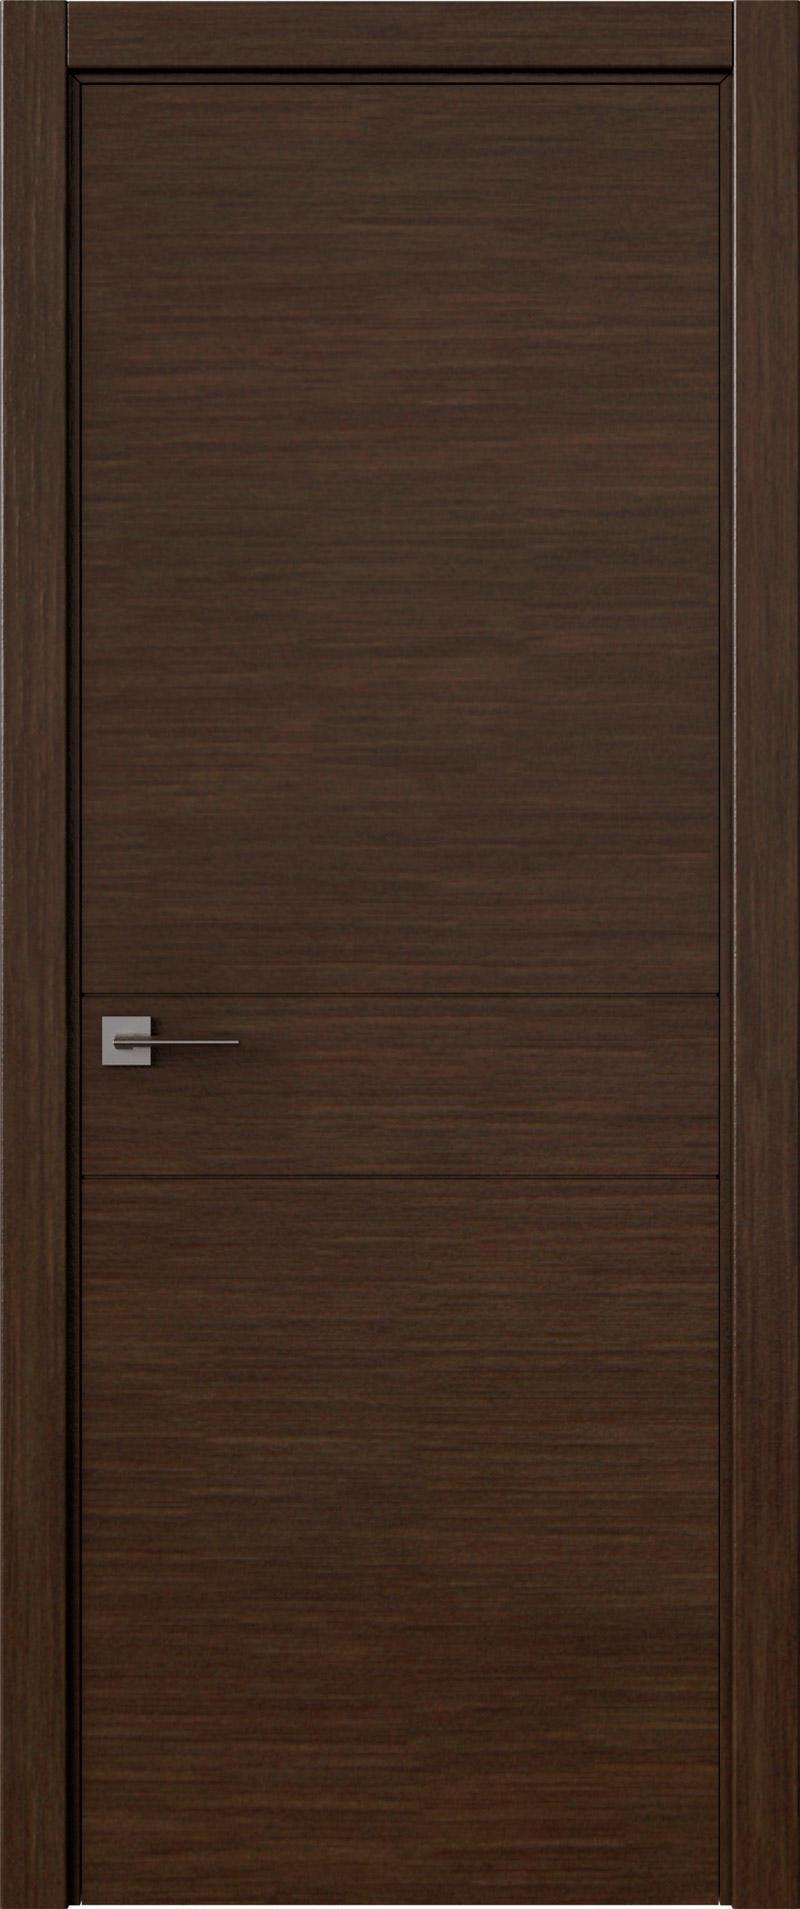 Tivoli И-2 цвет - Венге Без стекла (ДГ)